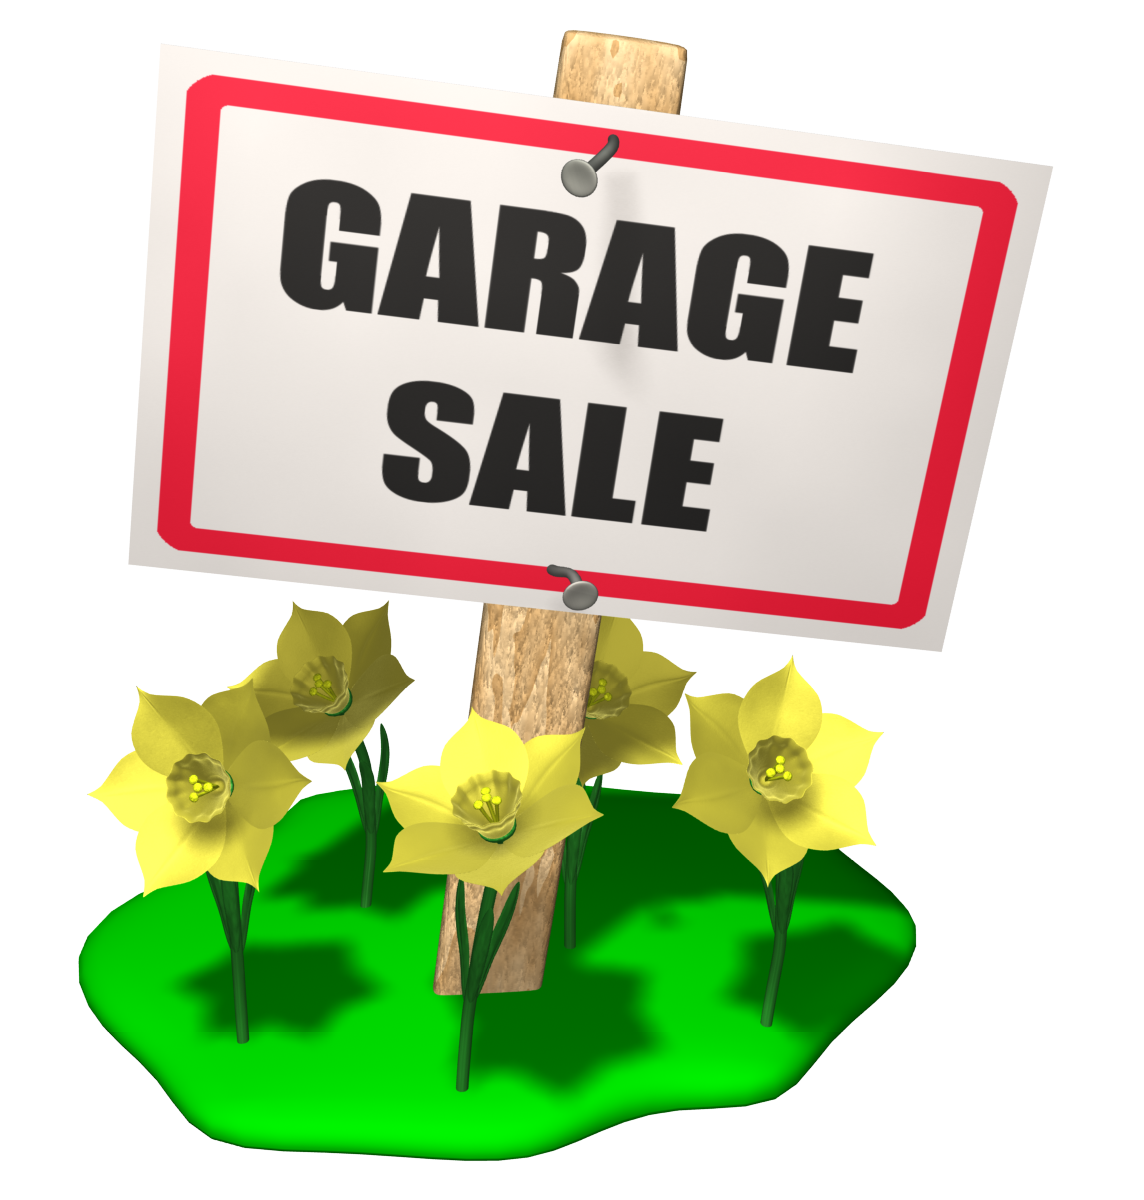 Church Rummage Sales This Weekend: Lipstick & Dipstick: Garage Sale In Portland This Weekend